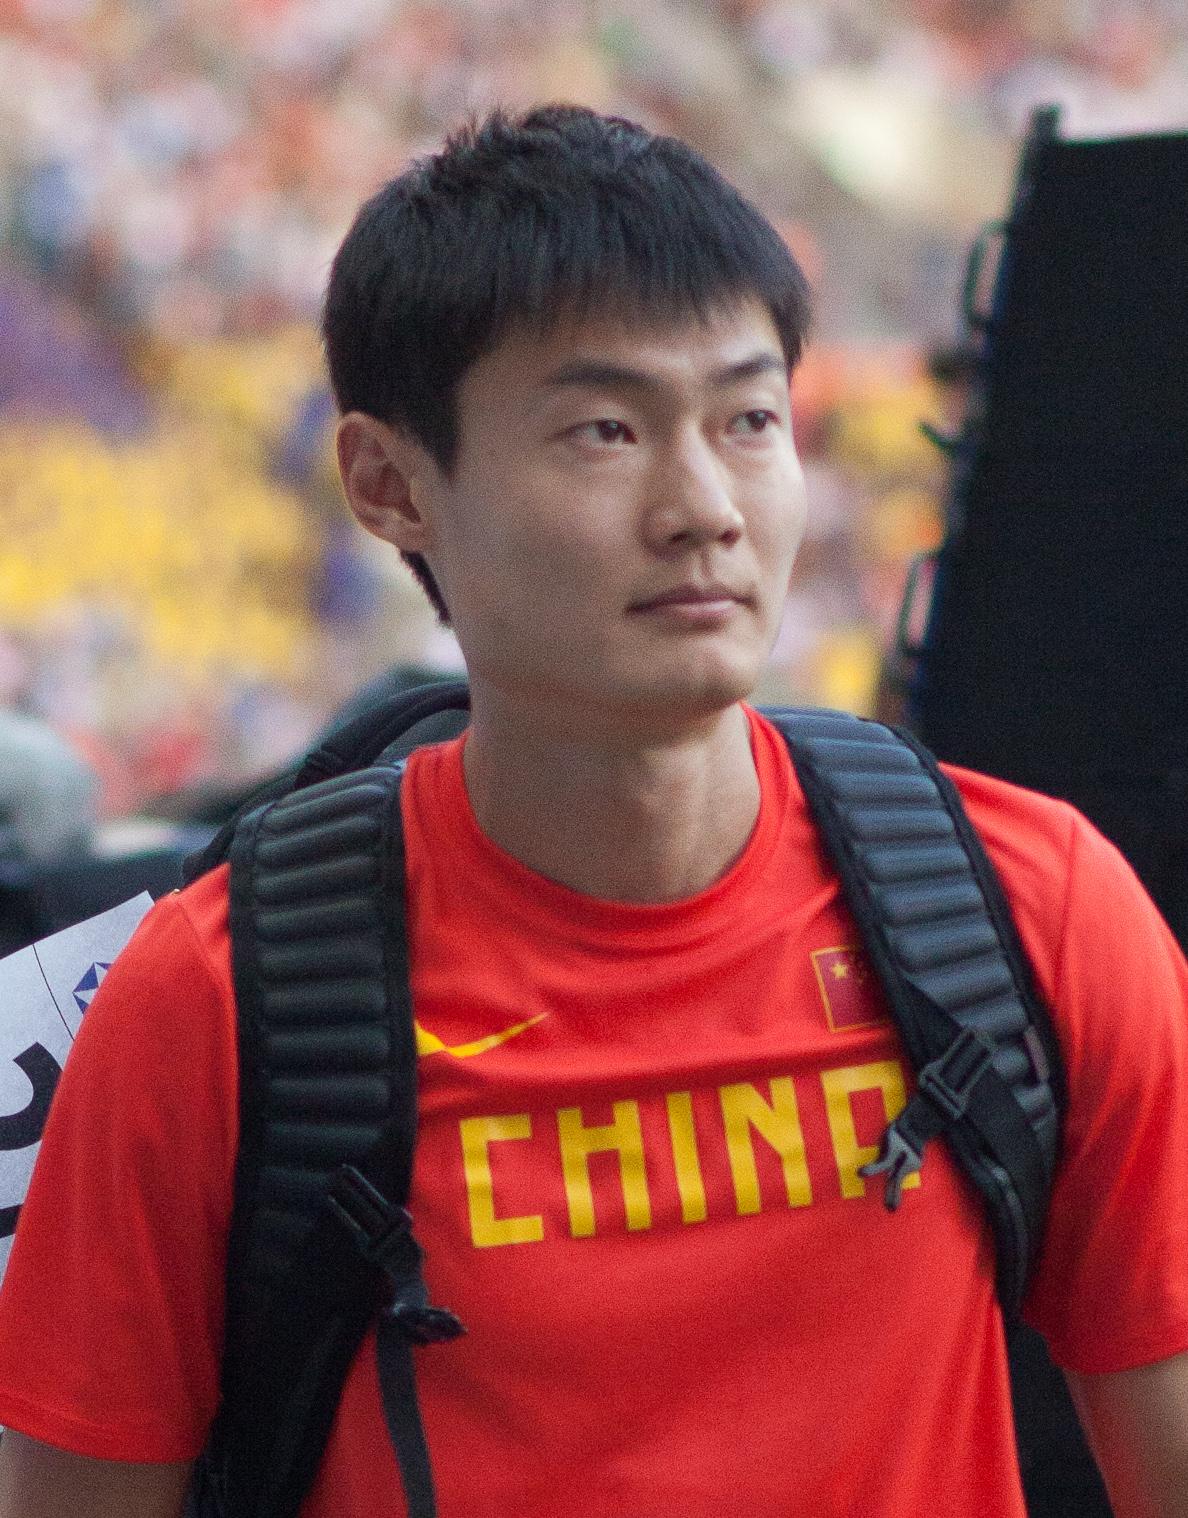 Chinese shanghai 2012 1 - 2 part 2